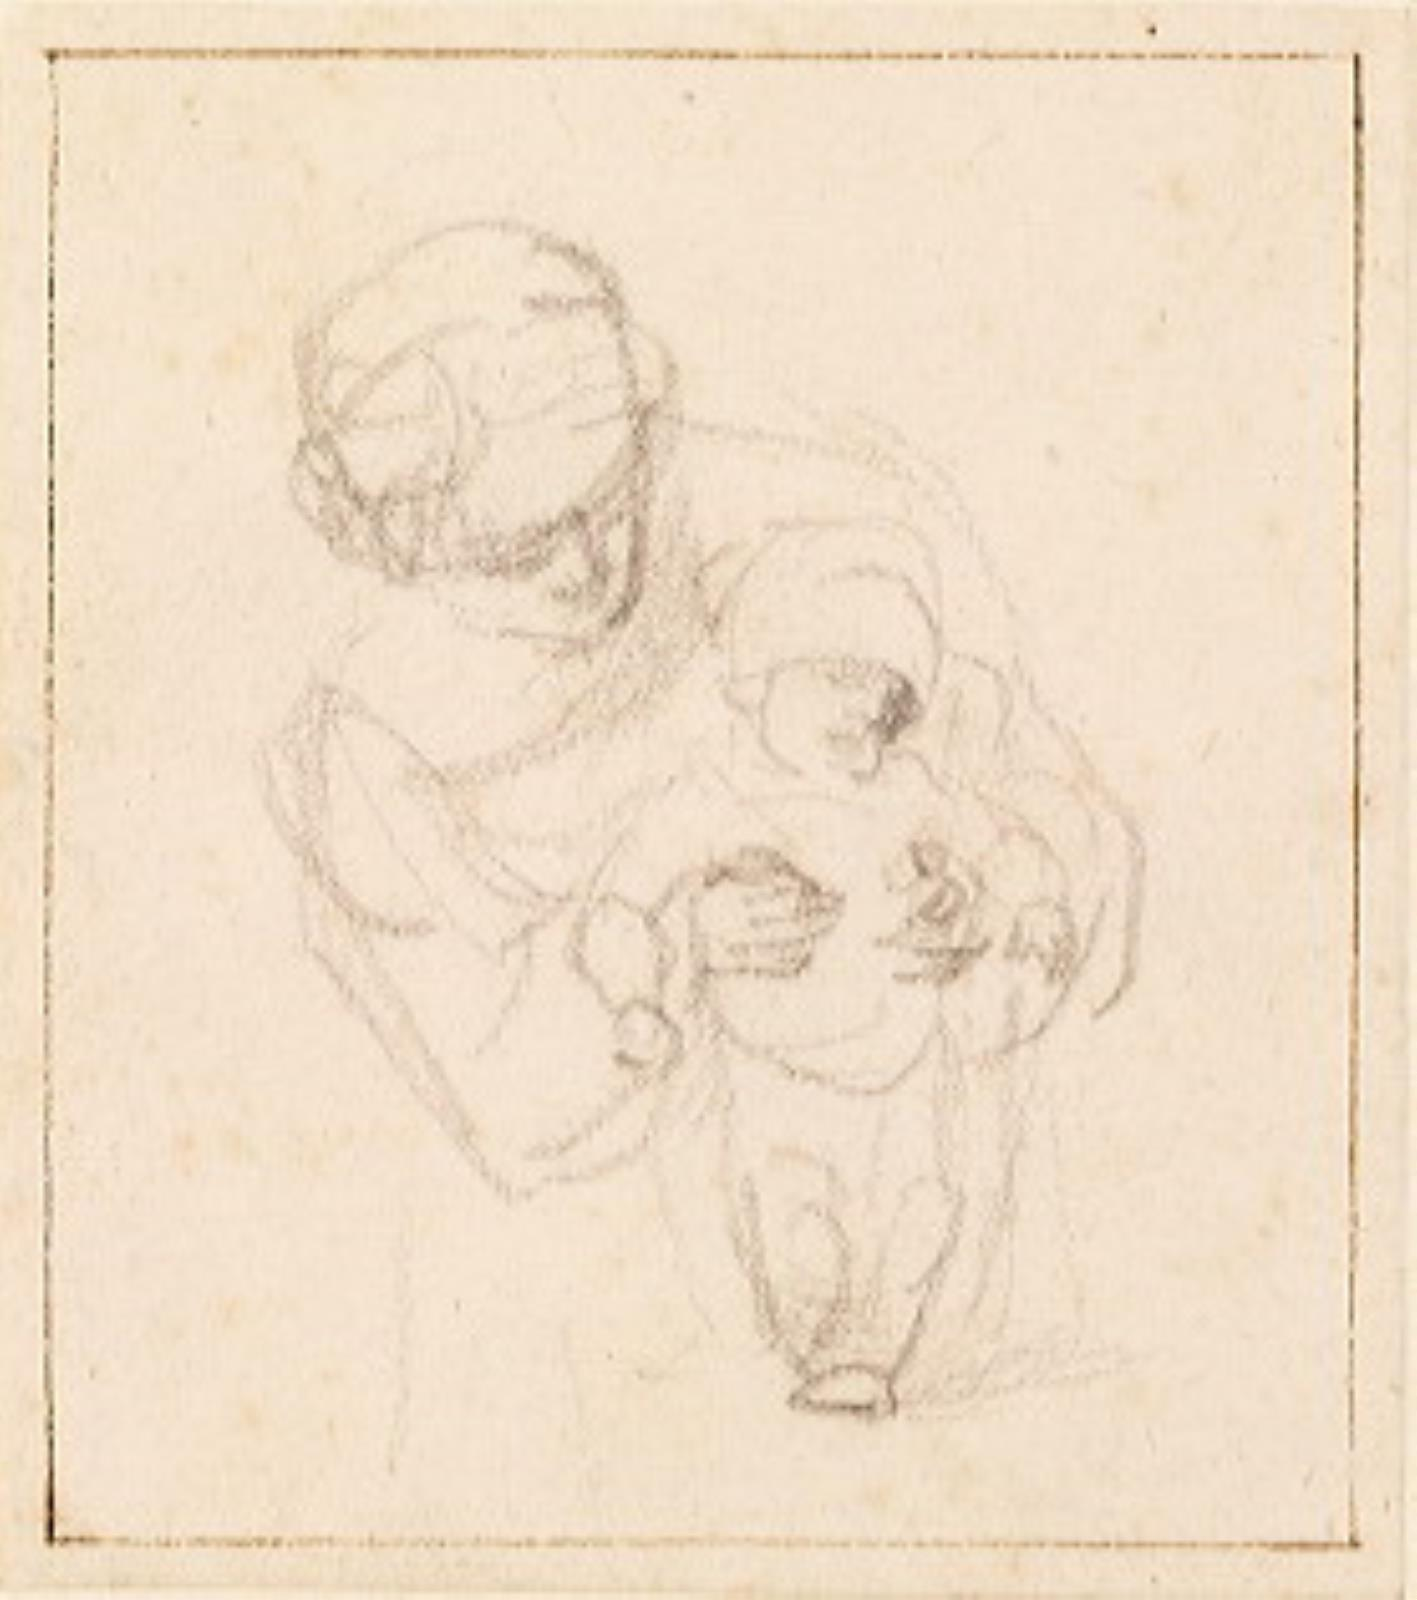 Rembrandt van Rijn (1606-1669), <em>Woman and Child</em>, ca. 1635-1637 Amsterdam Museum, Amsterdam